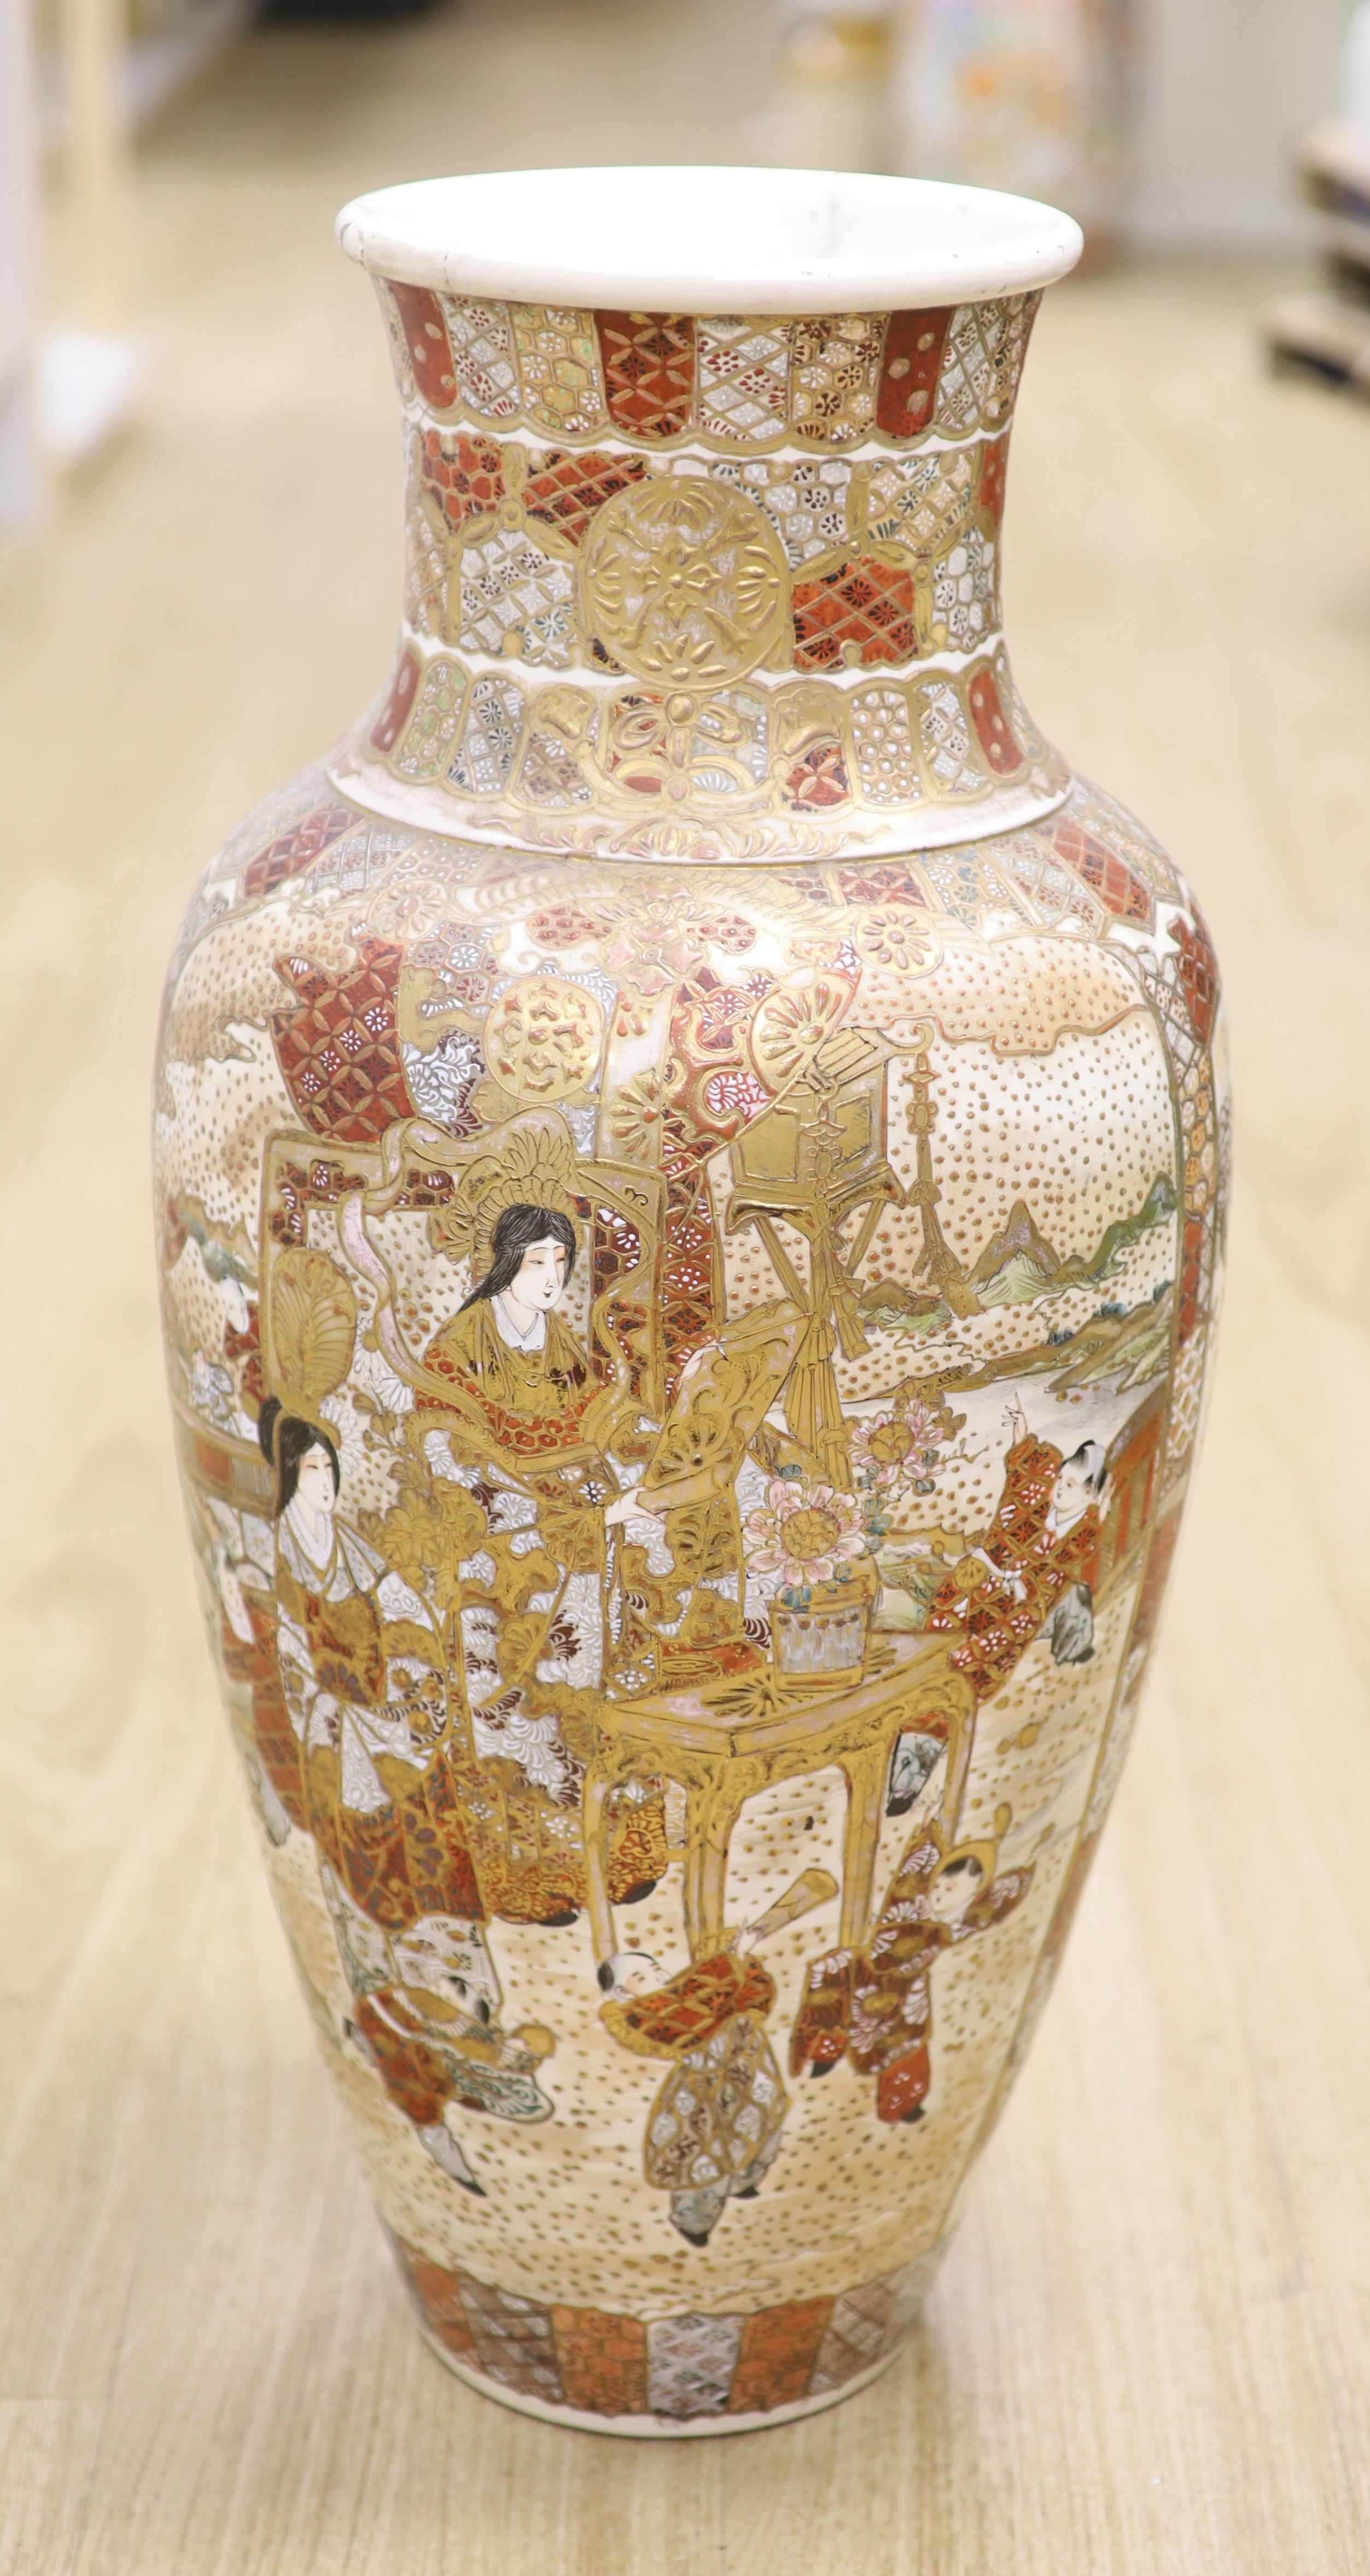 A large Satsuma pottery vase, height 63cm